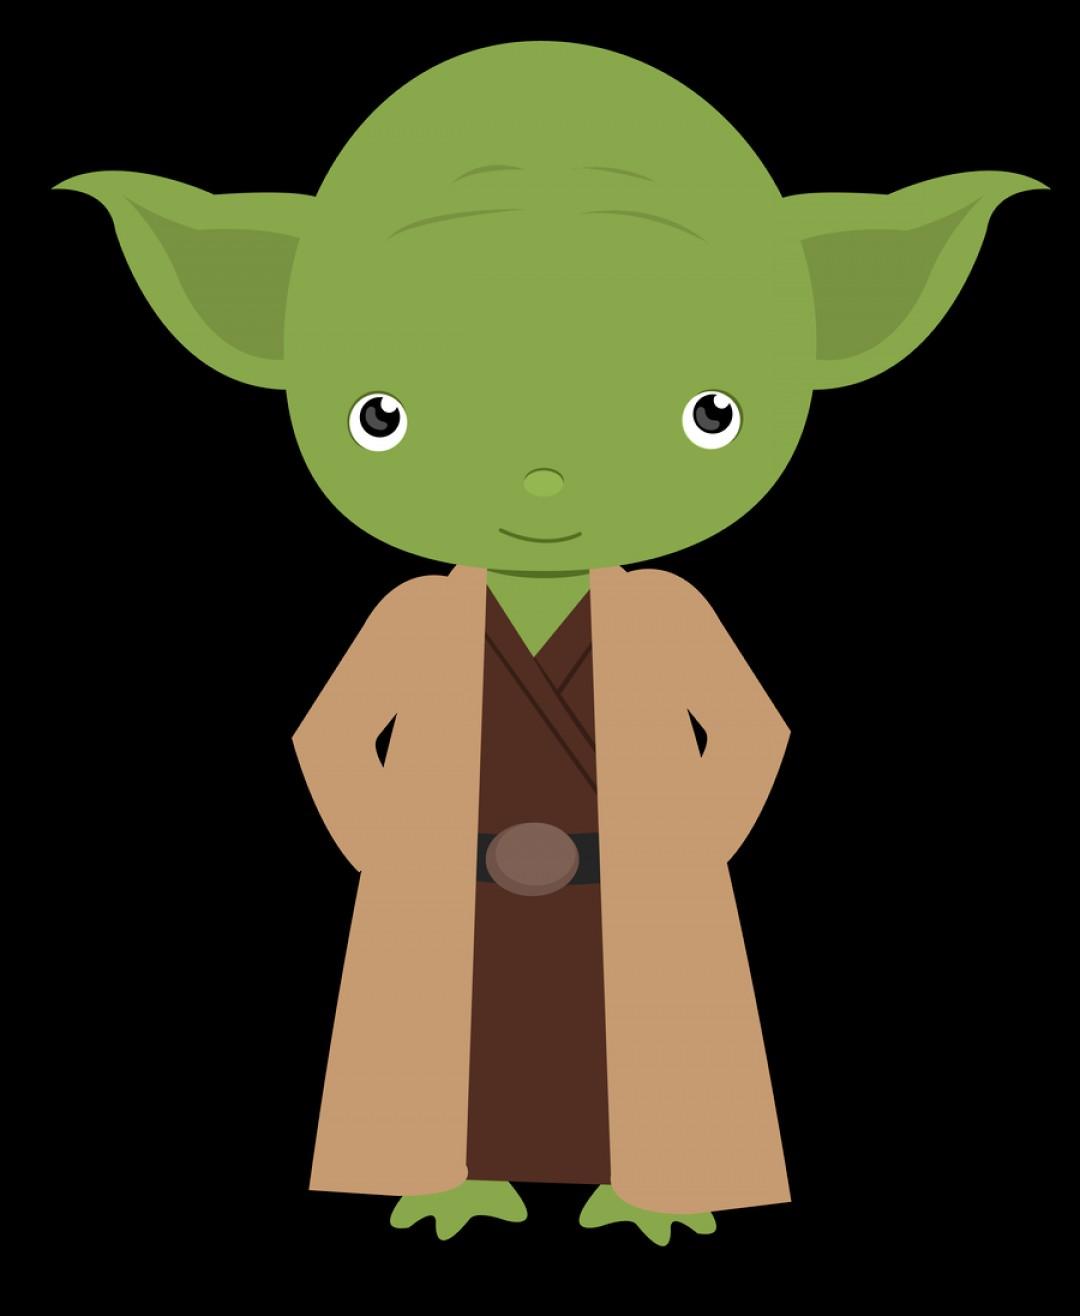 Baby Star Wars Princess Leia Clipart.